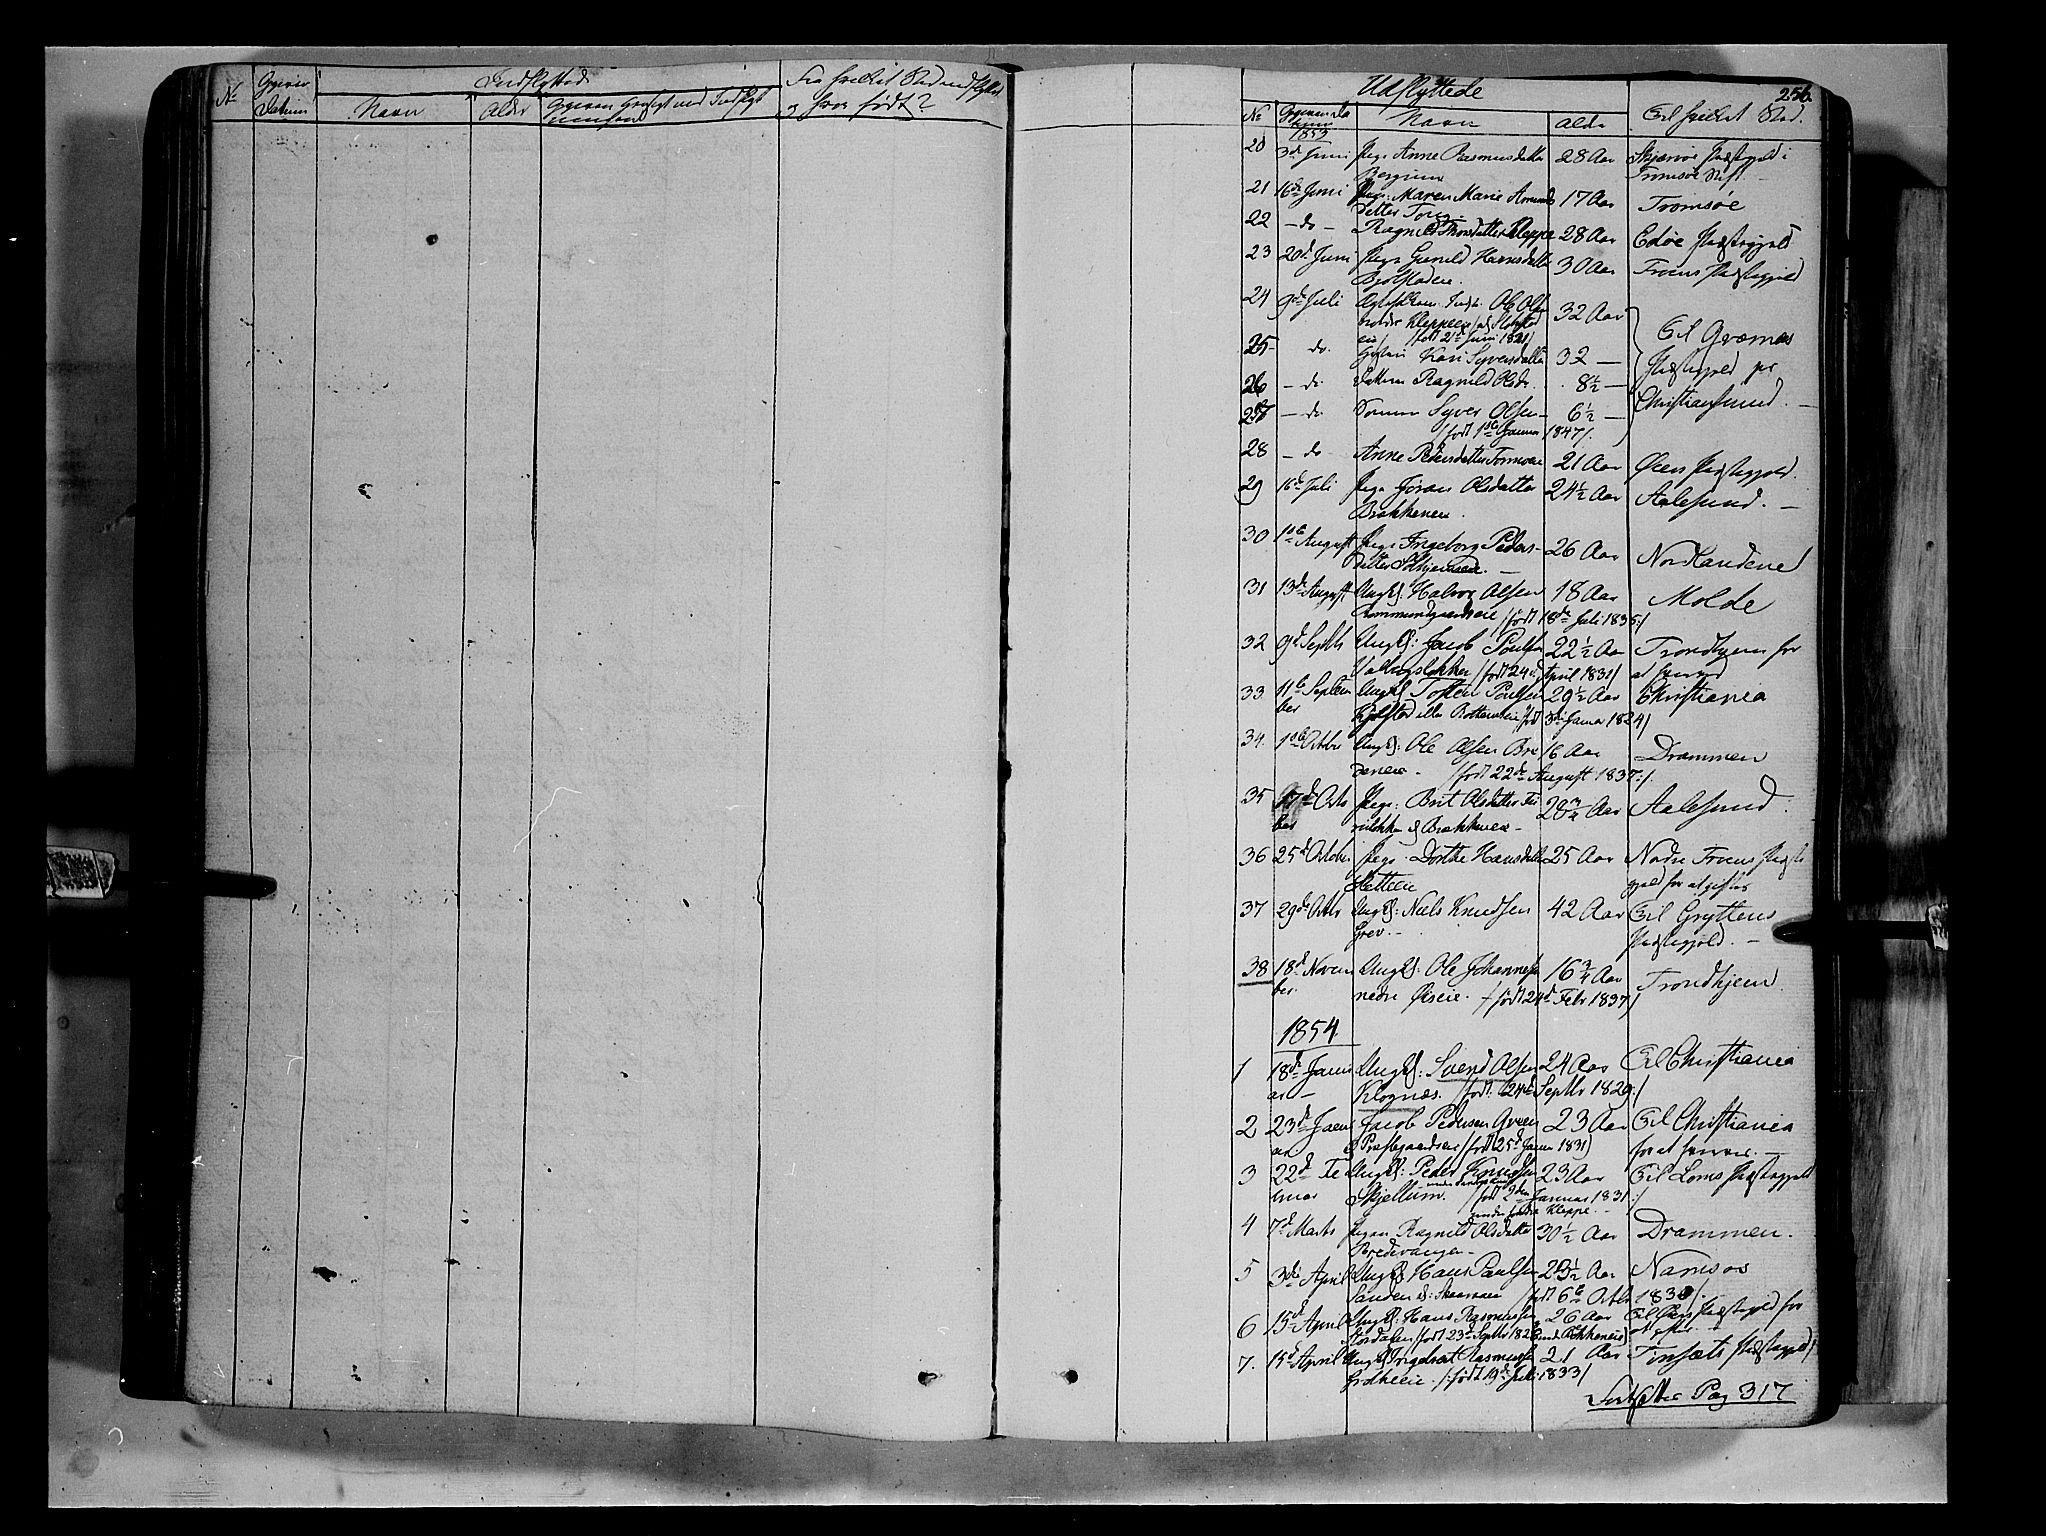 SAH, Vågå prestekontor, Ministerialbok nr. 5 /1, 1842-1856, s. 256